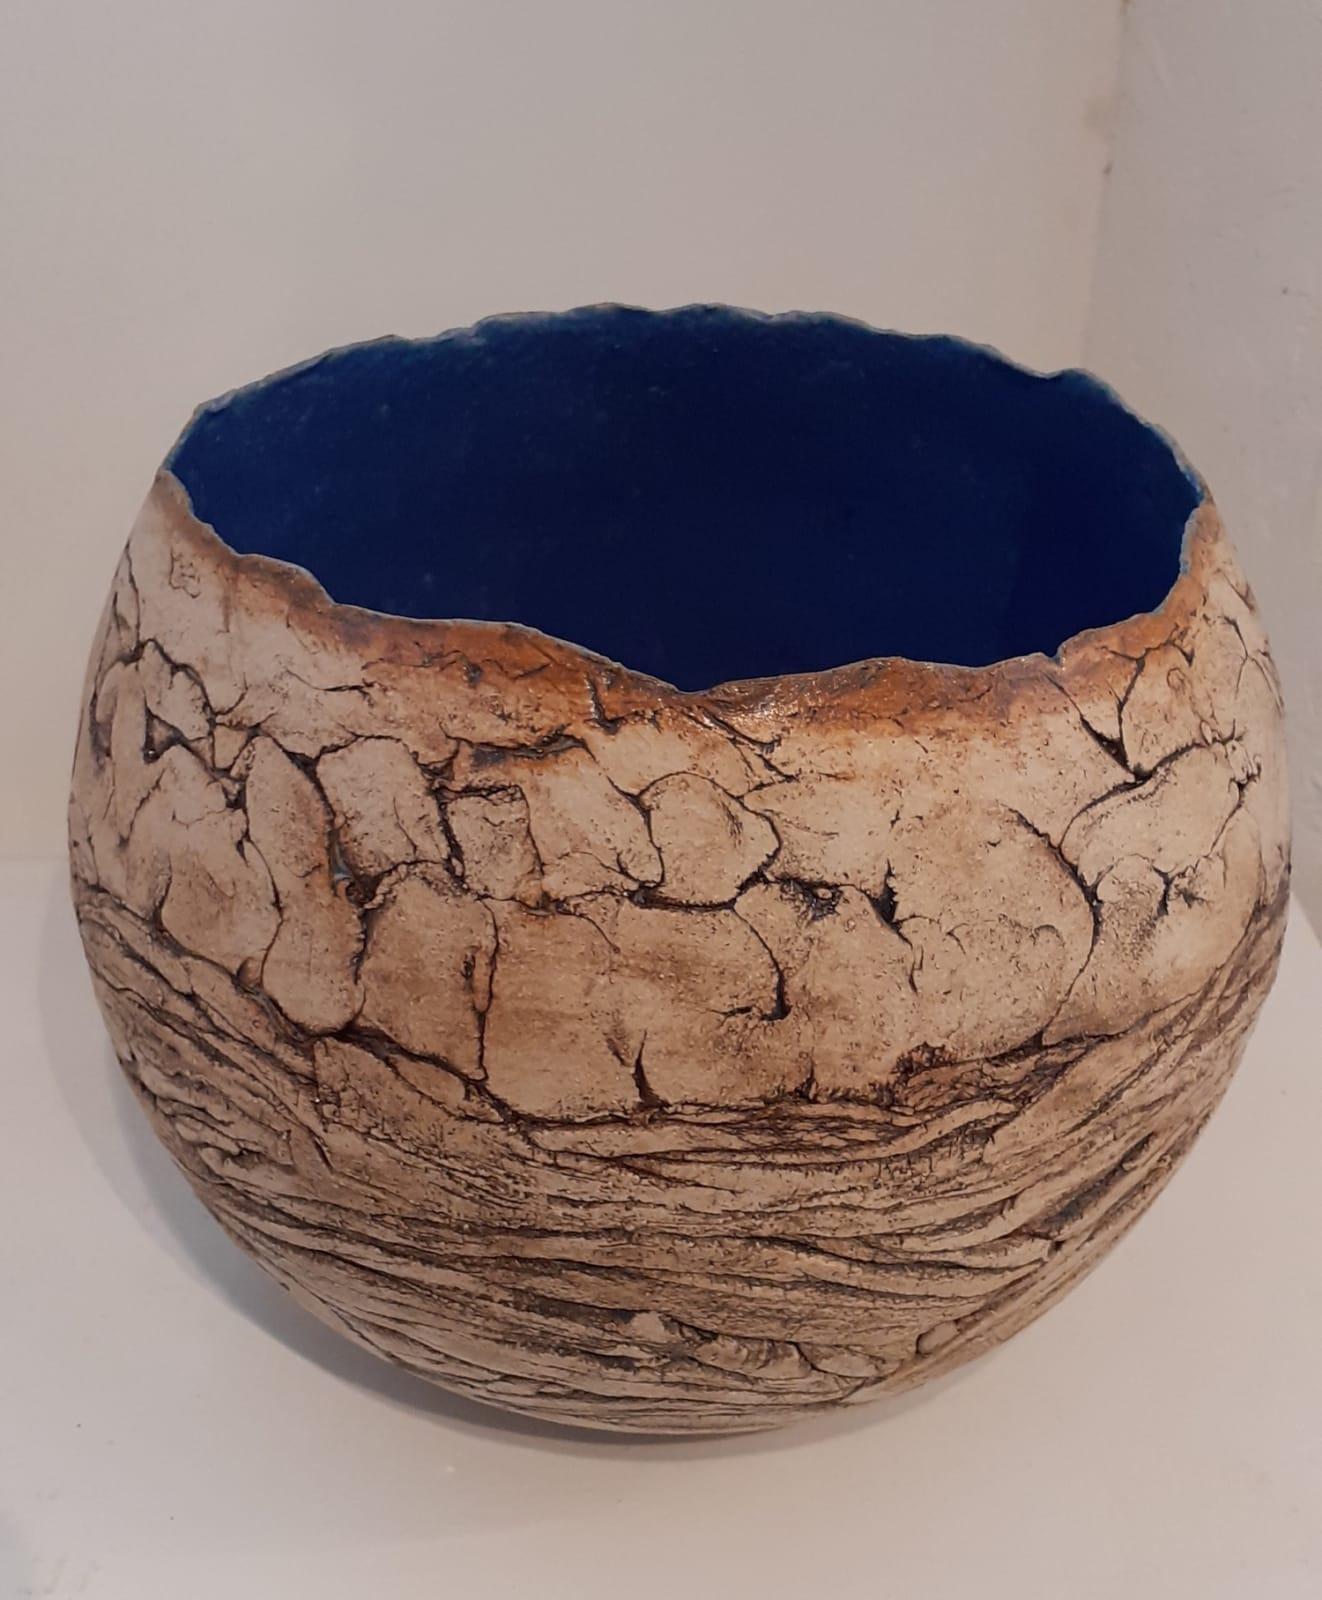 Wenna Crockatt, Bowl (large)